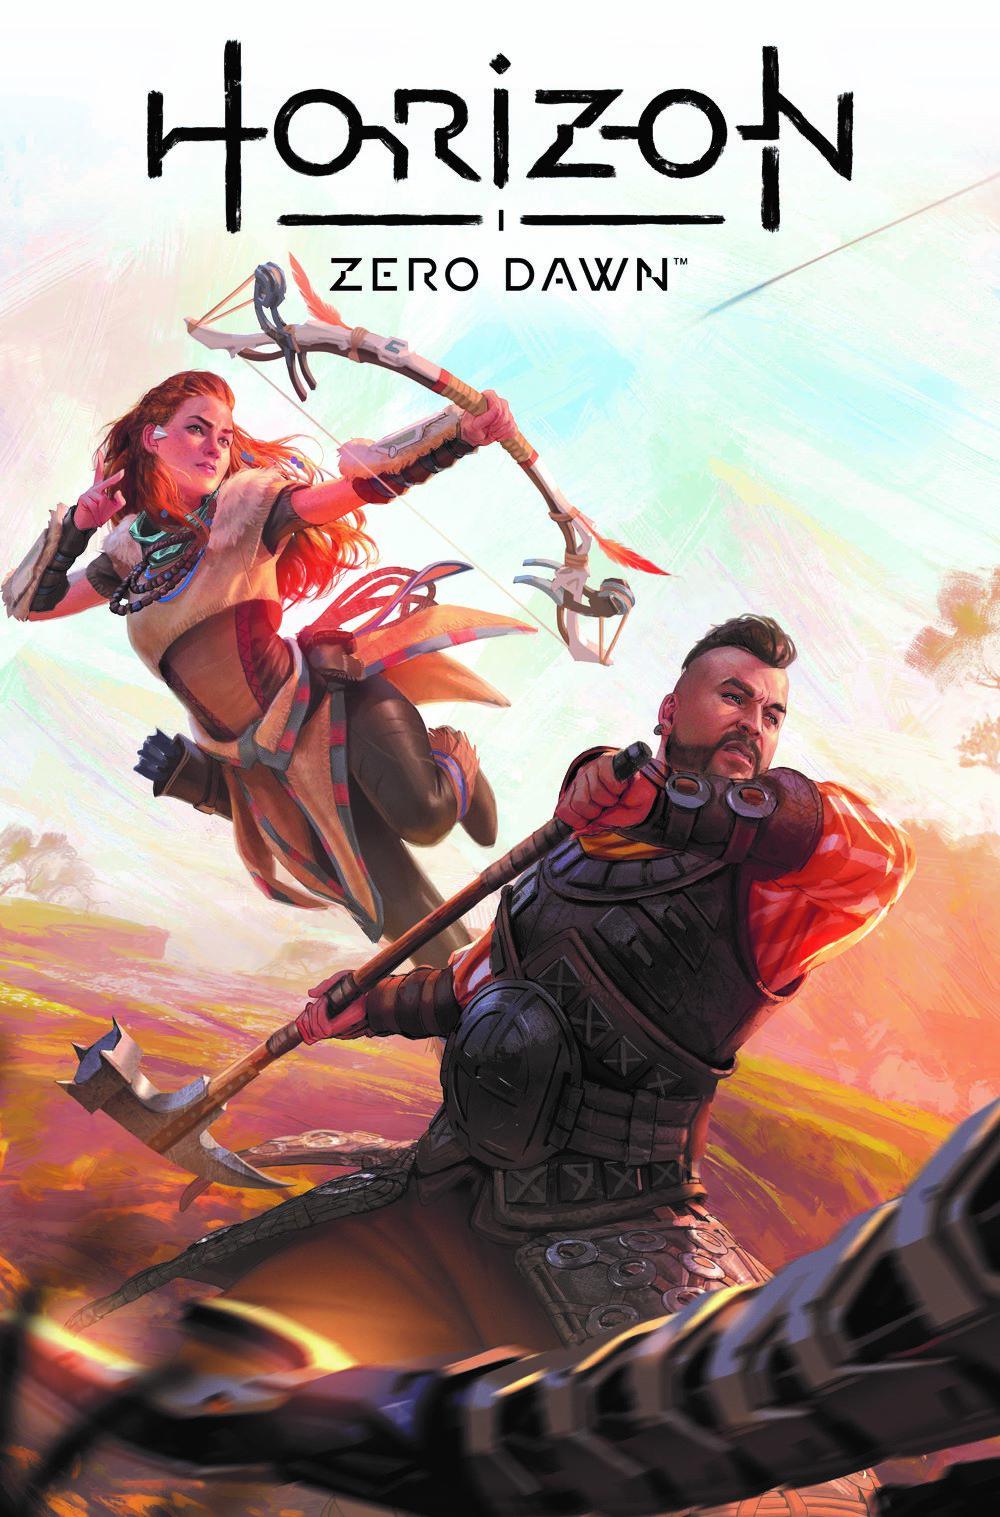 HorizonZeroDawn21_00_CoverE_WILKINS-1 Titan Comics July 2021 Solicitations